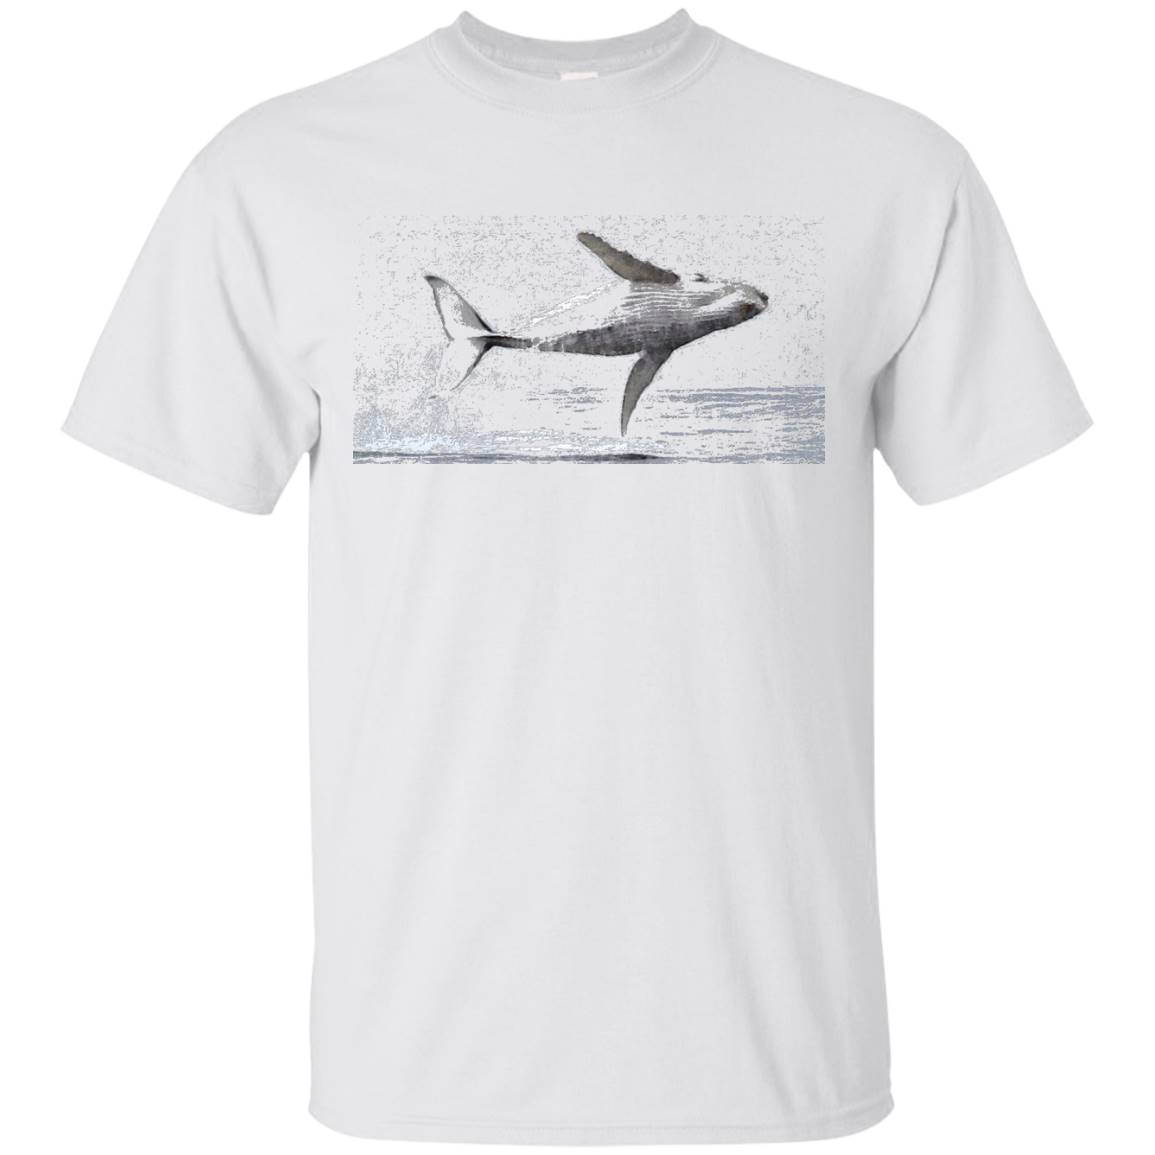 Humpback Whale Tee Shirt Flying high colorful – T-Shirt